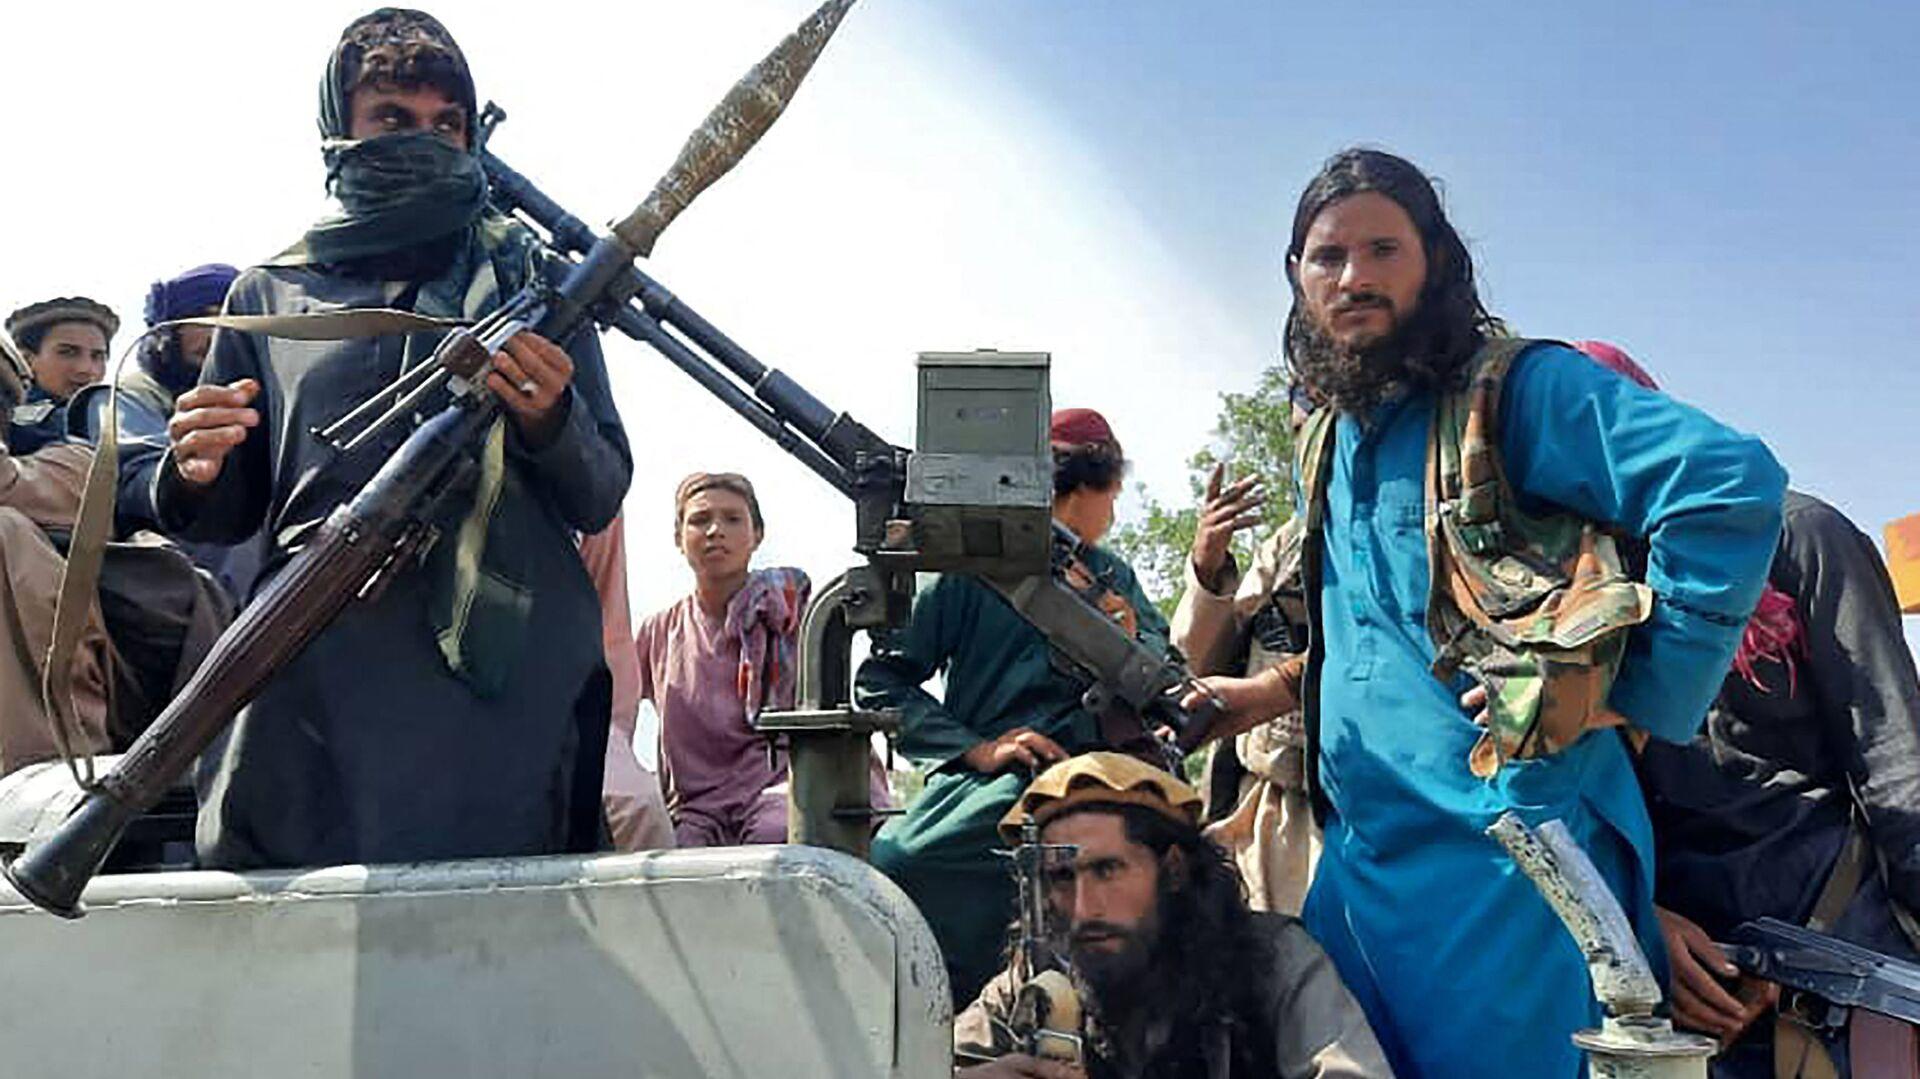 Боевики Талибана* в провинции Лагман, Афганистан - Sputnik Армения, 1920, 23.09.2021